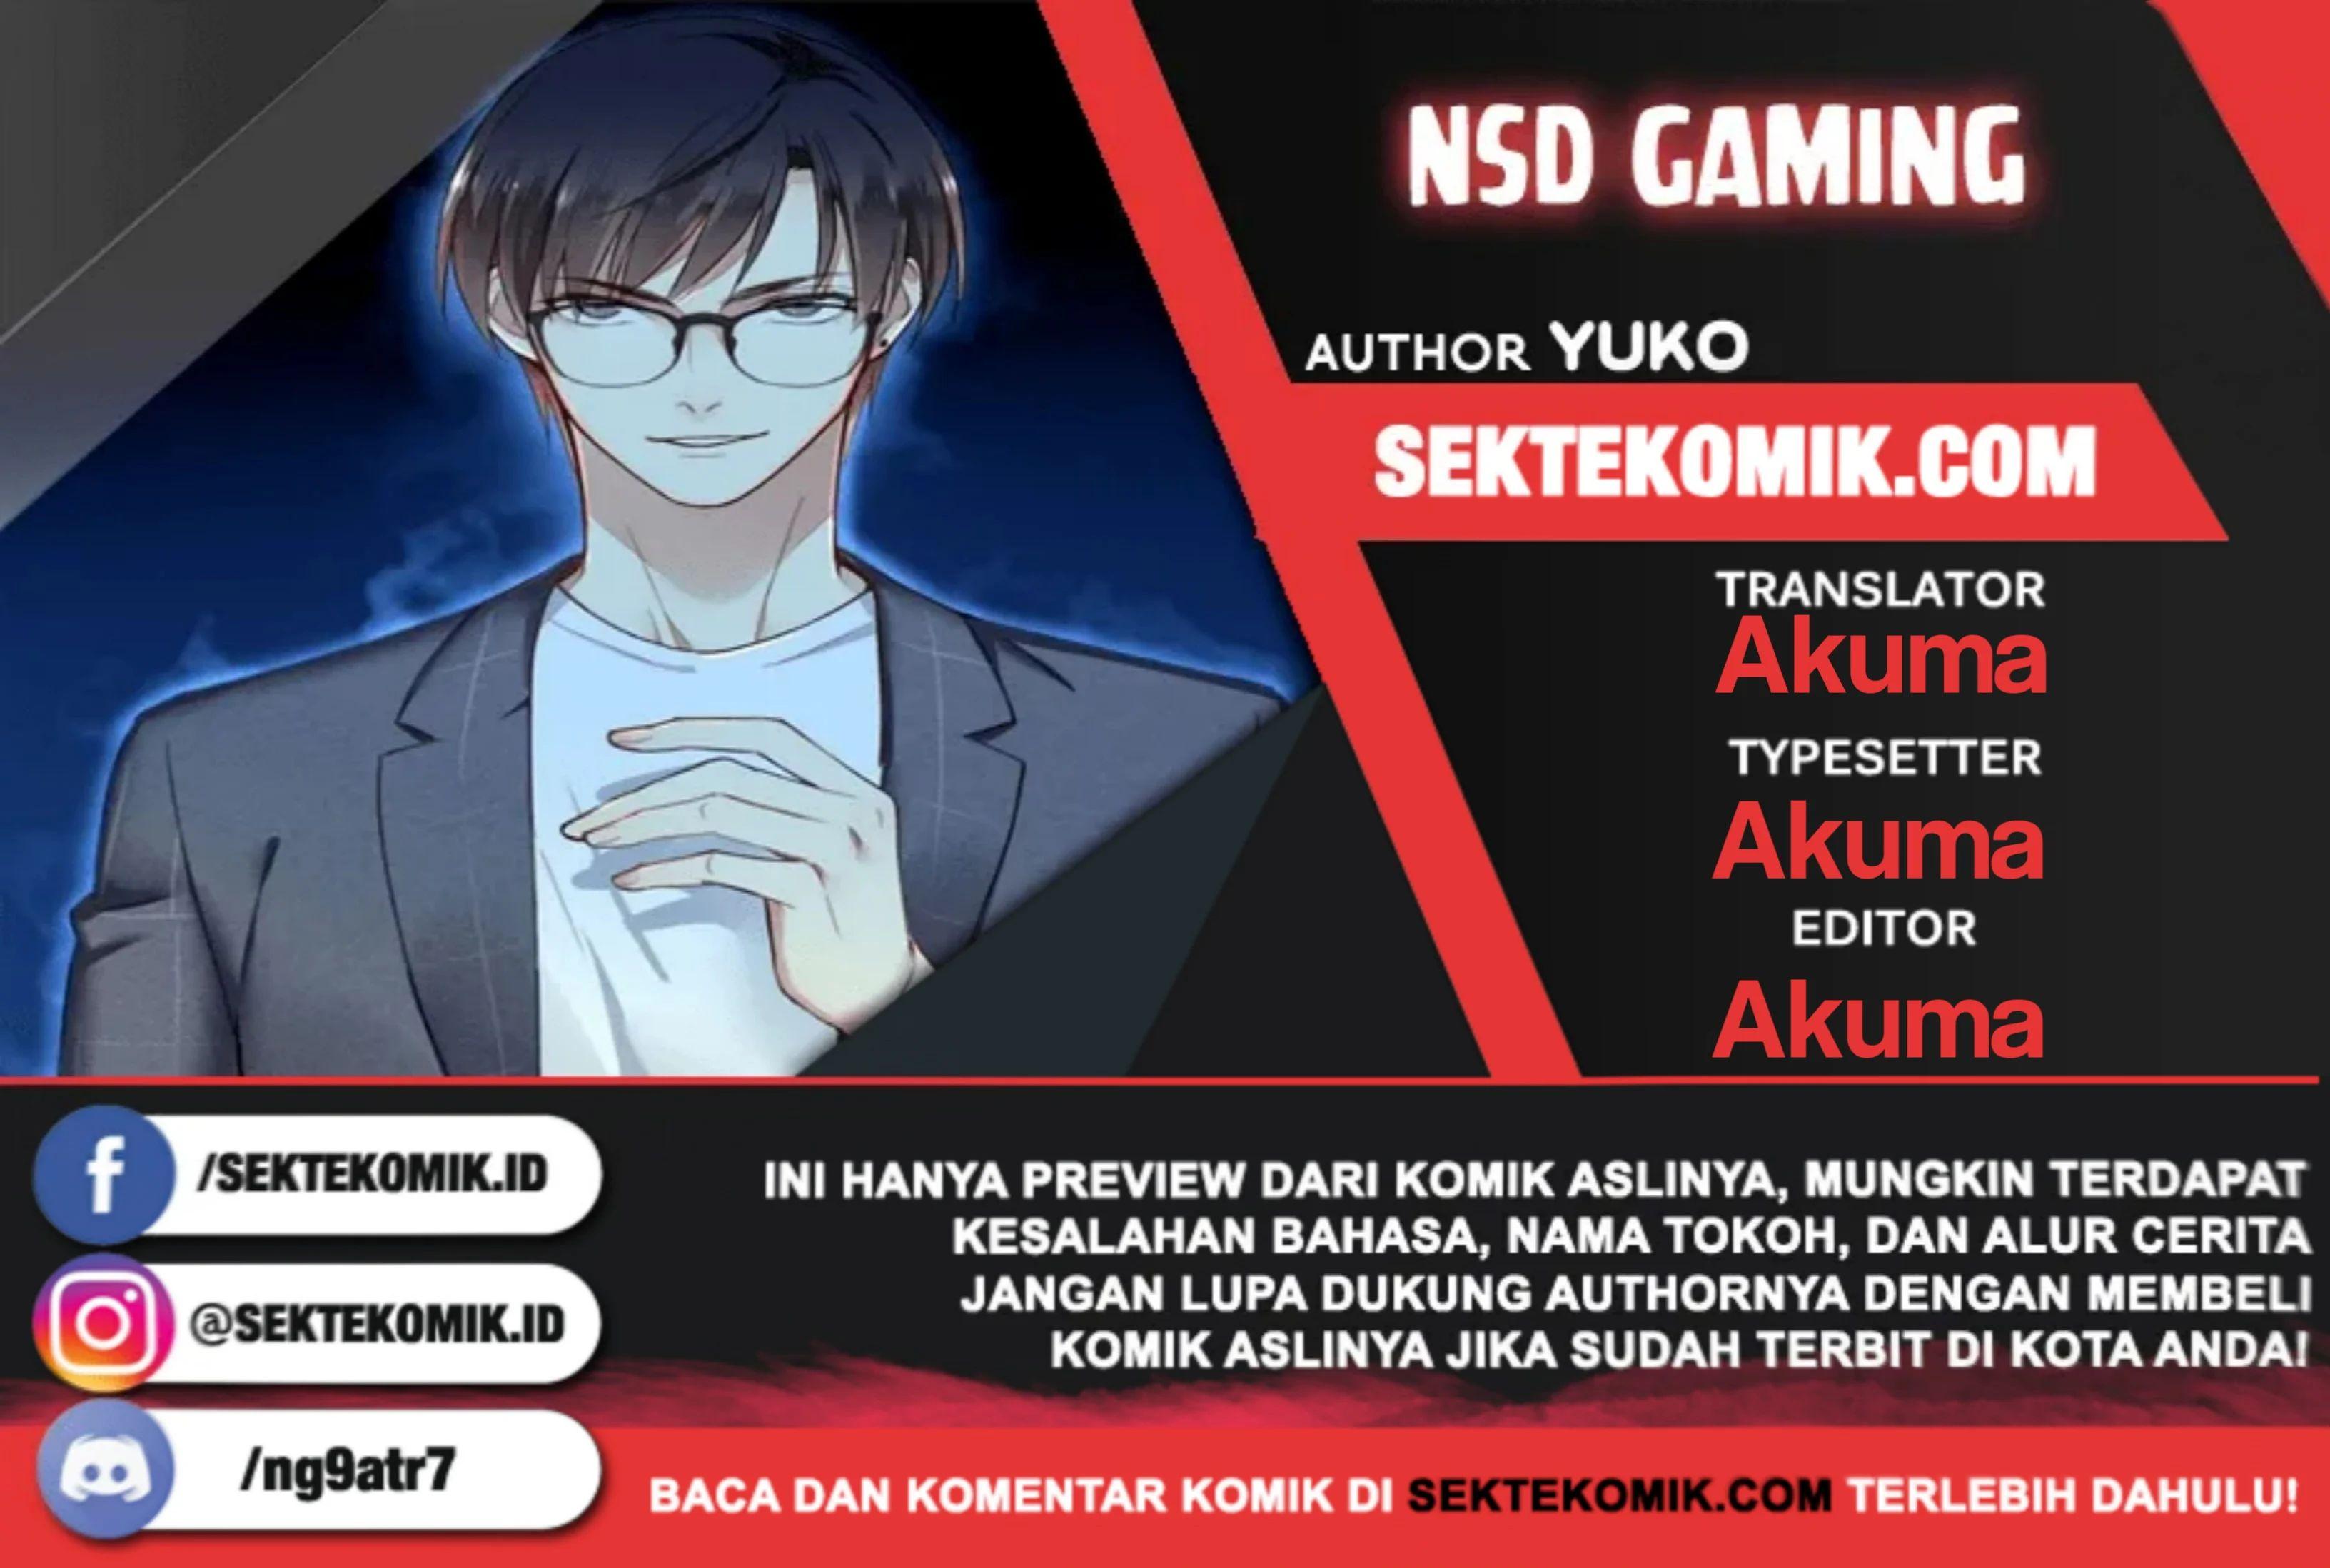 Nsd Gaming Chapter 165